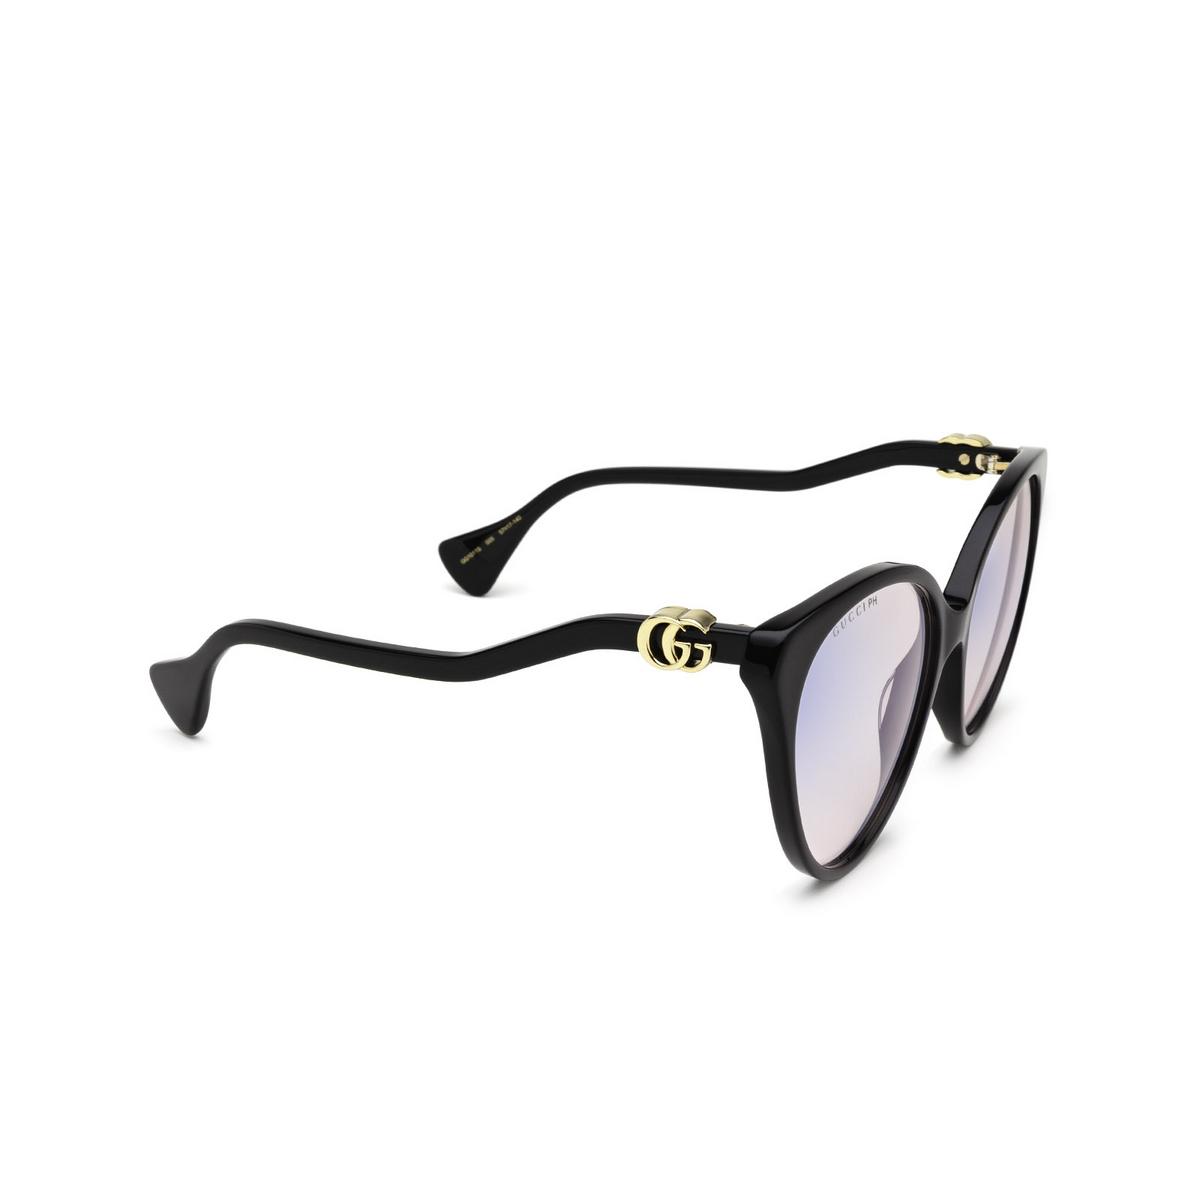 Gucci® Cat-eye Sunglasses: GG1011S color Black 005 - three-quarters view.